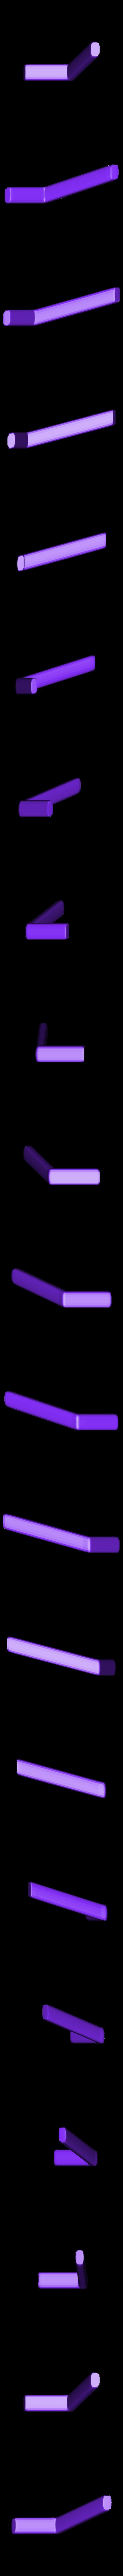 FeetLeft.STL Download STL file Vans RV-10 • 3D print template, Eduardohbm